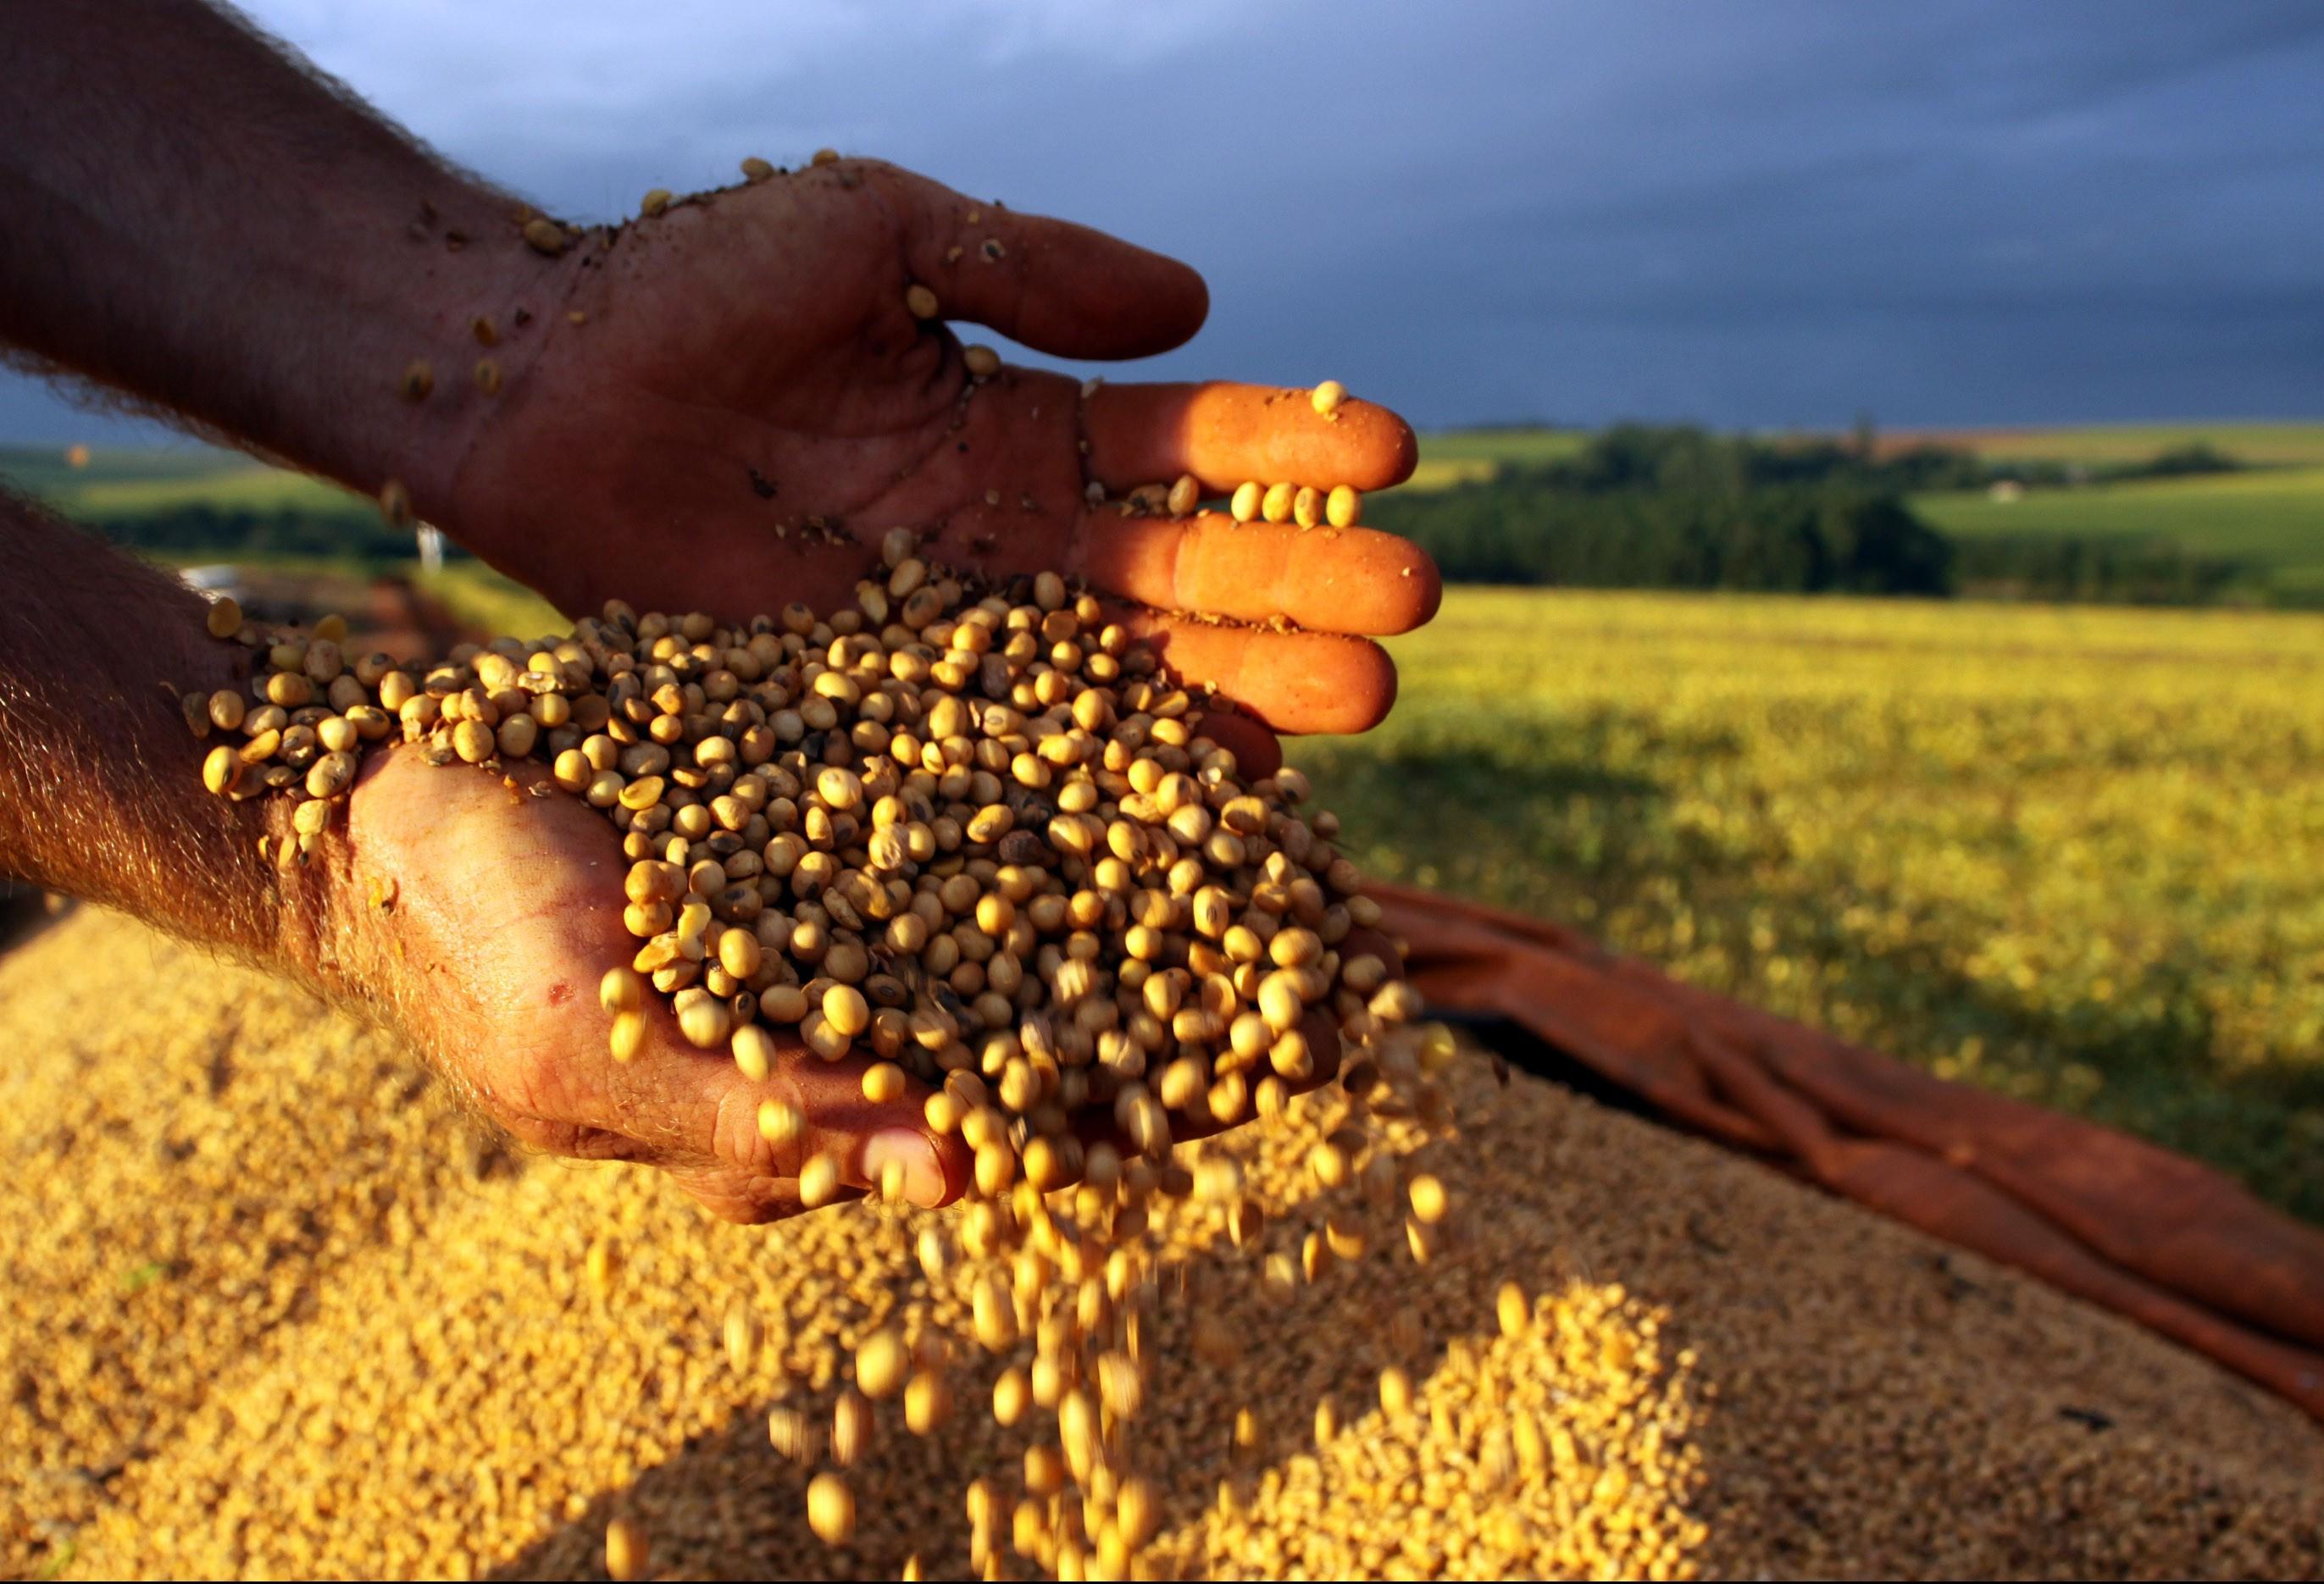 Saca da soja custa R$ 78,50 em Maringá